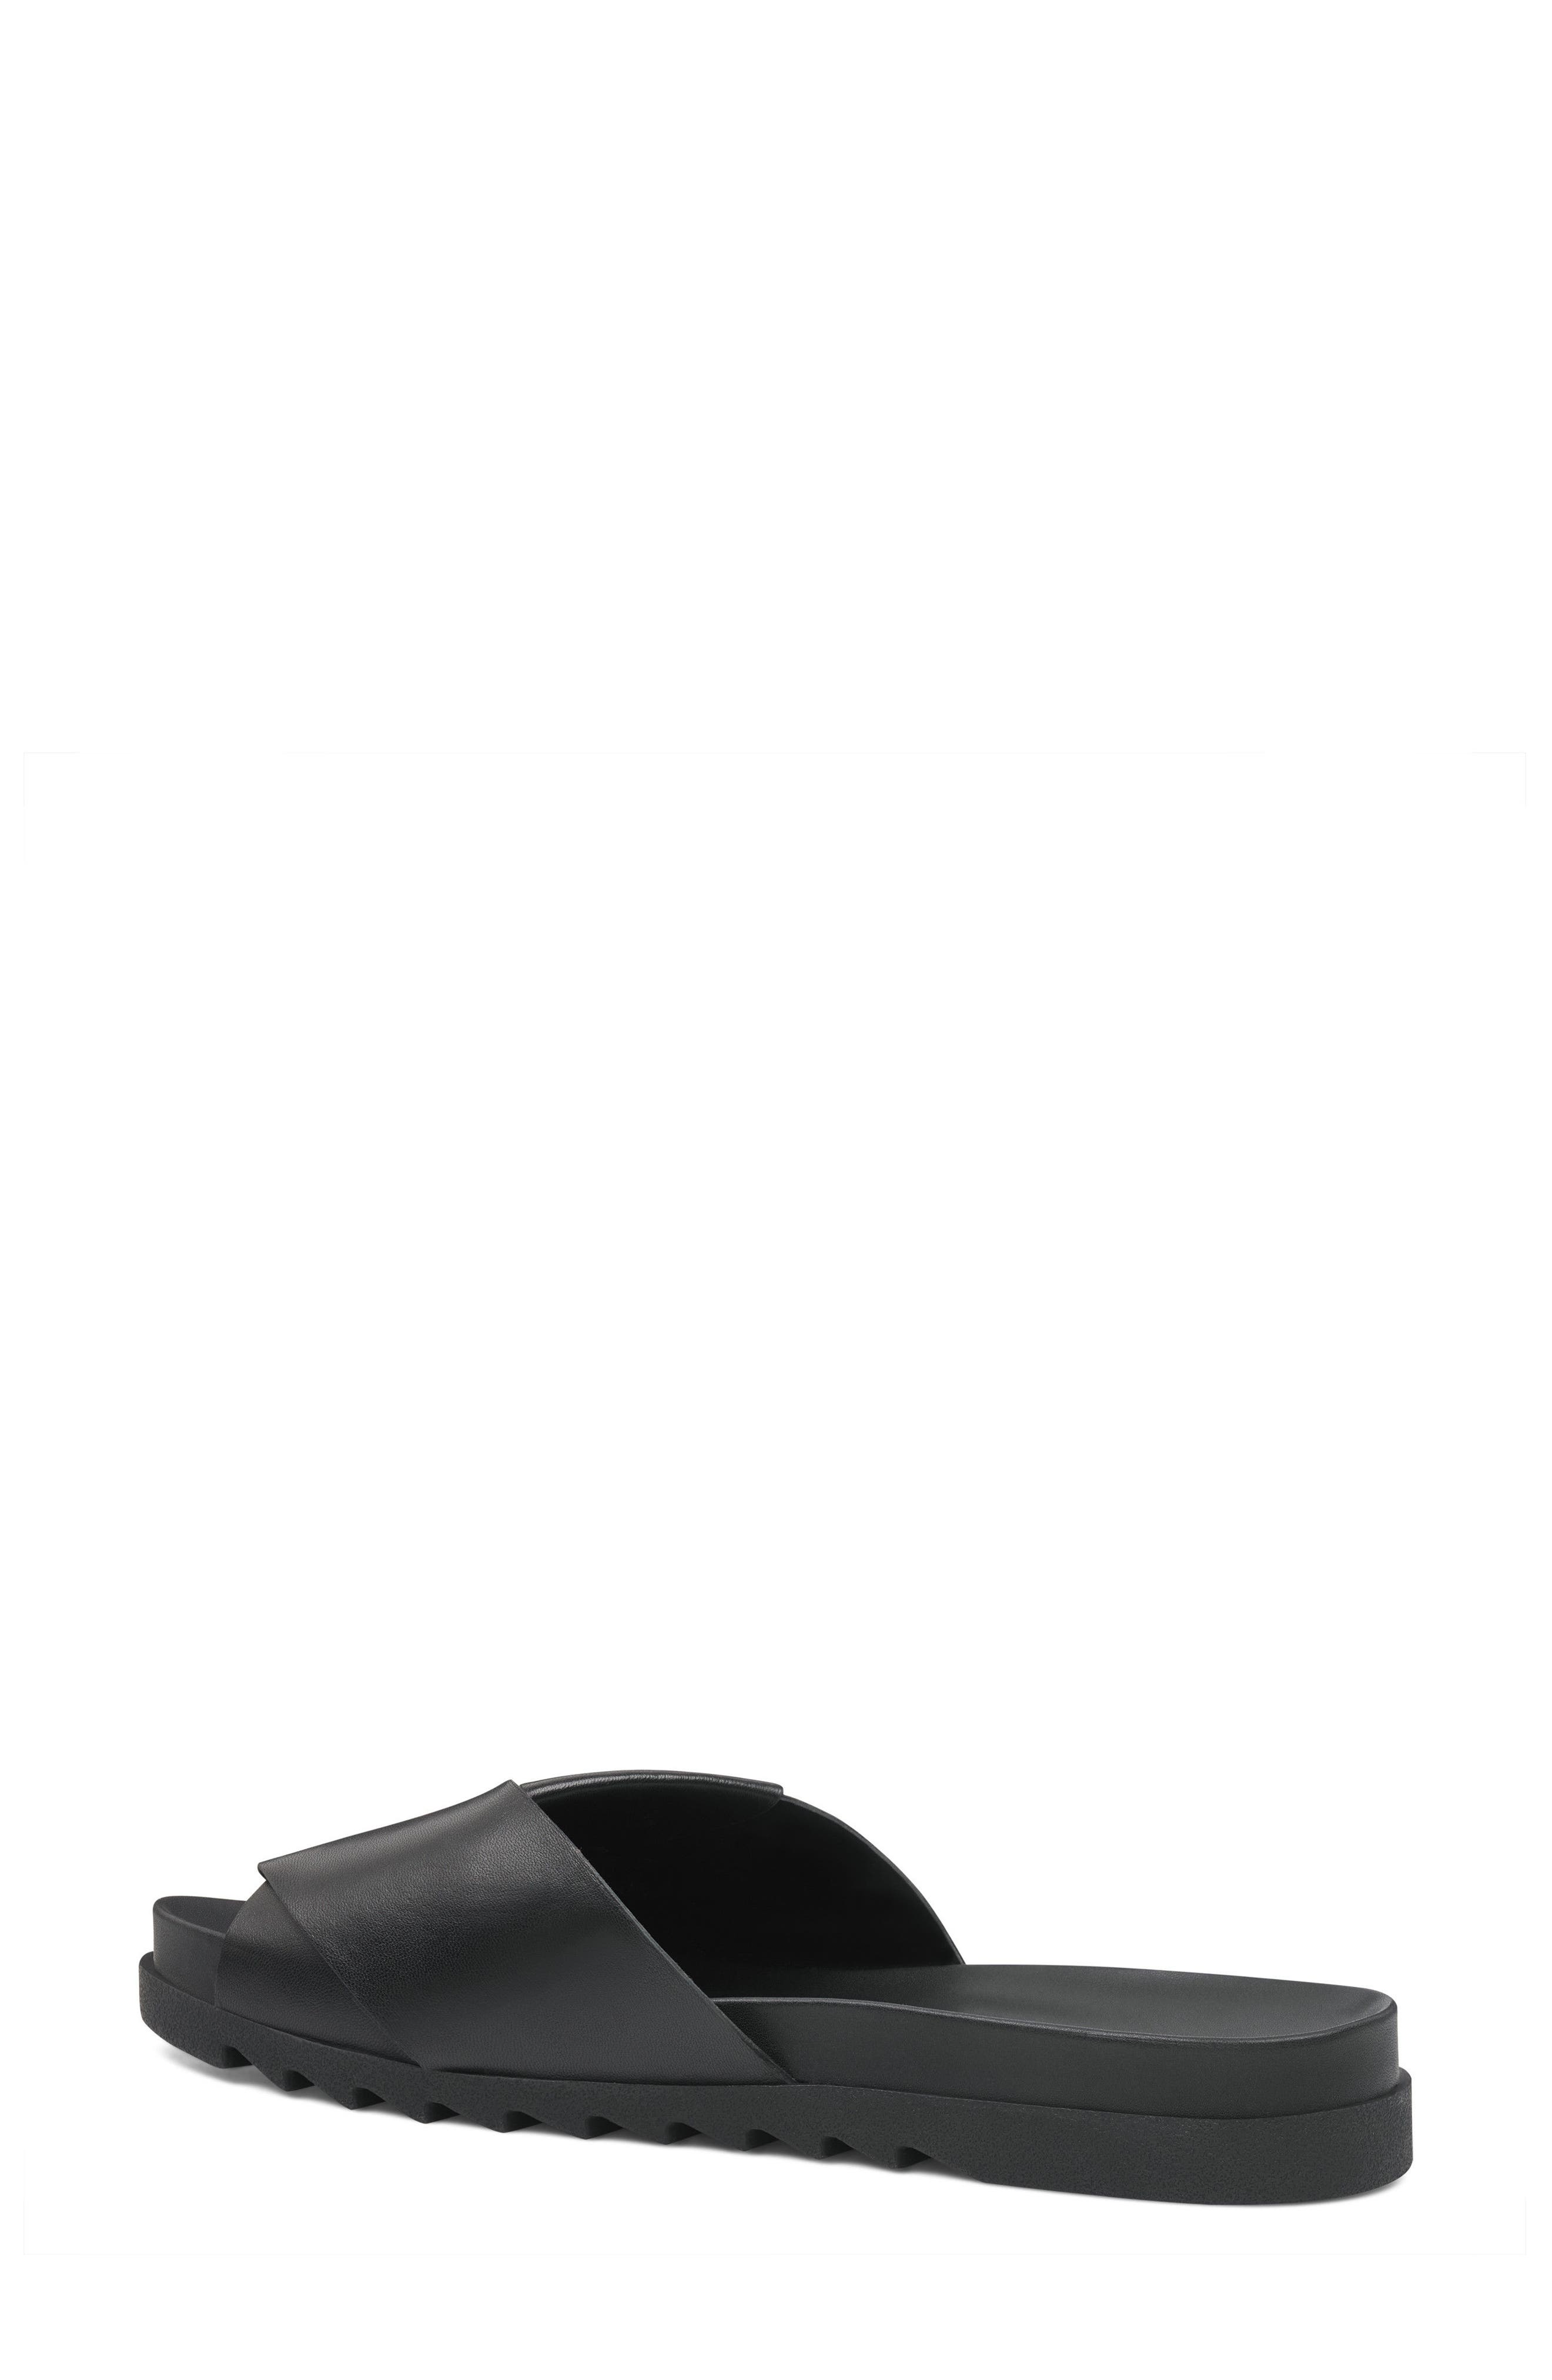 Furaish Slide Sandal,                             Alternate thumbnail 2, color,                             001